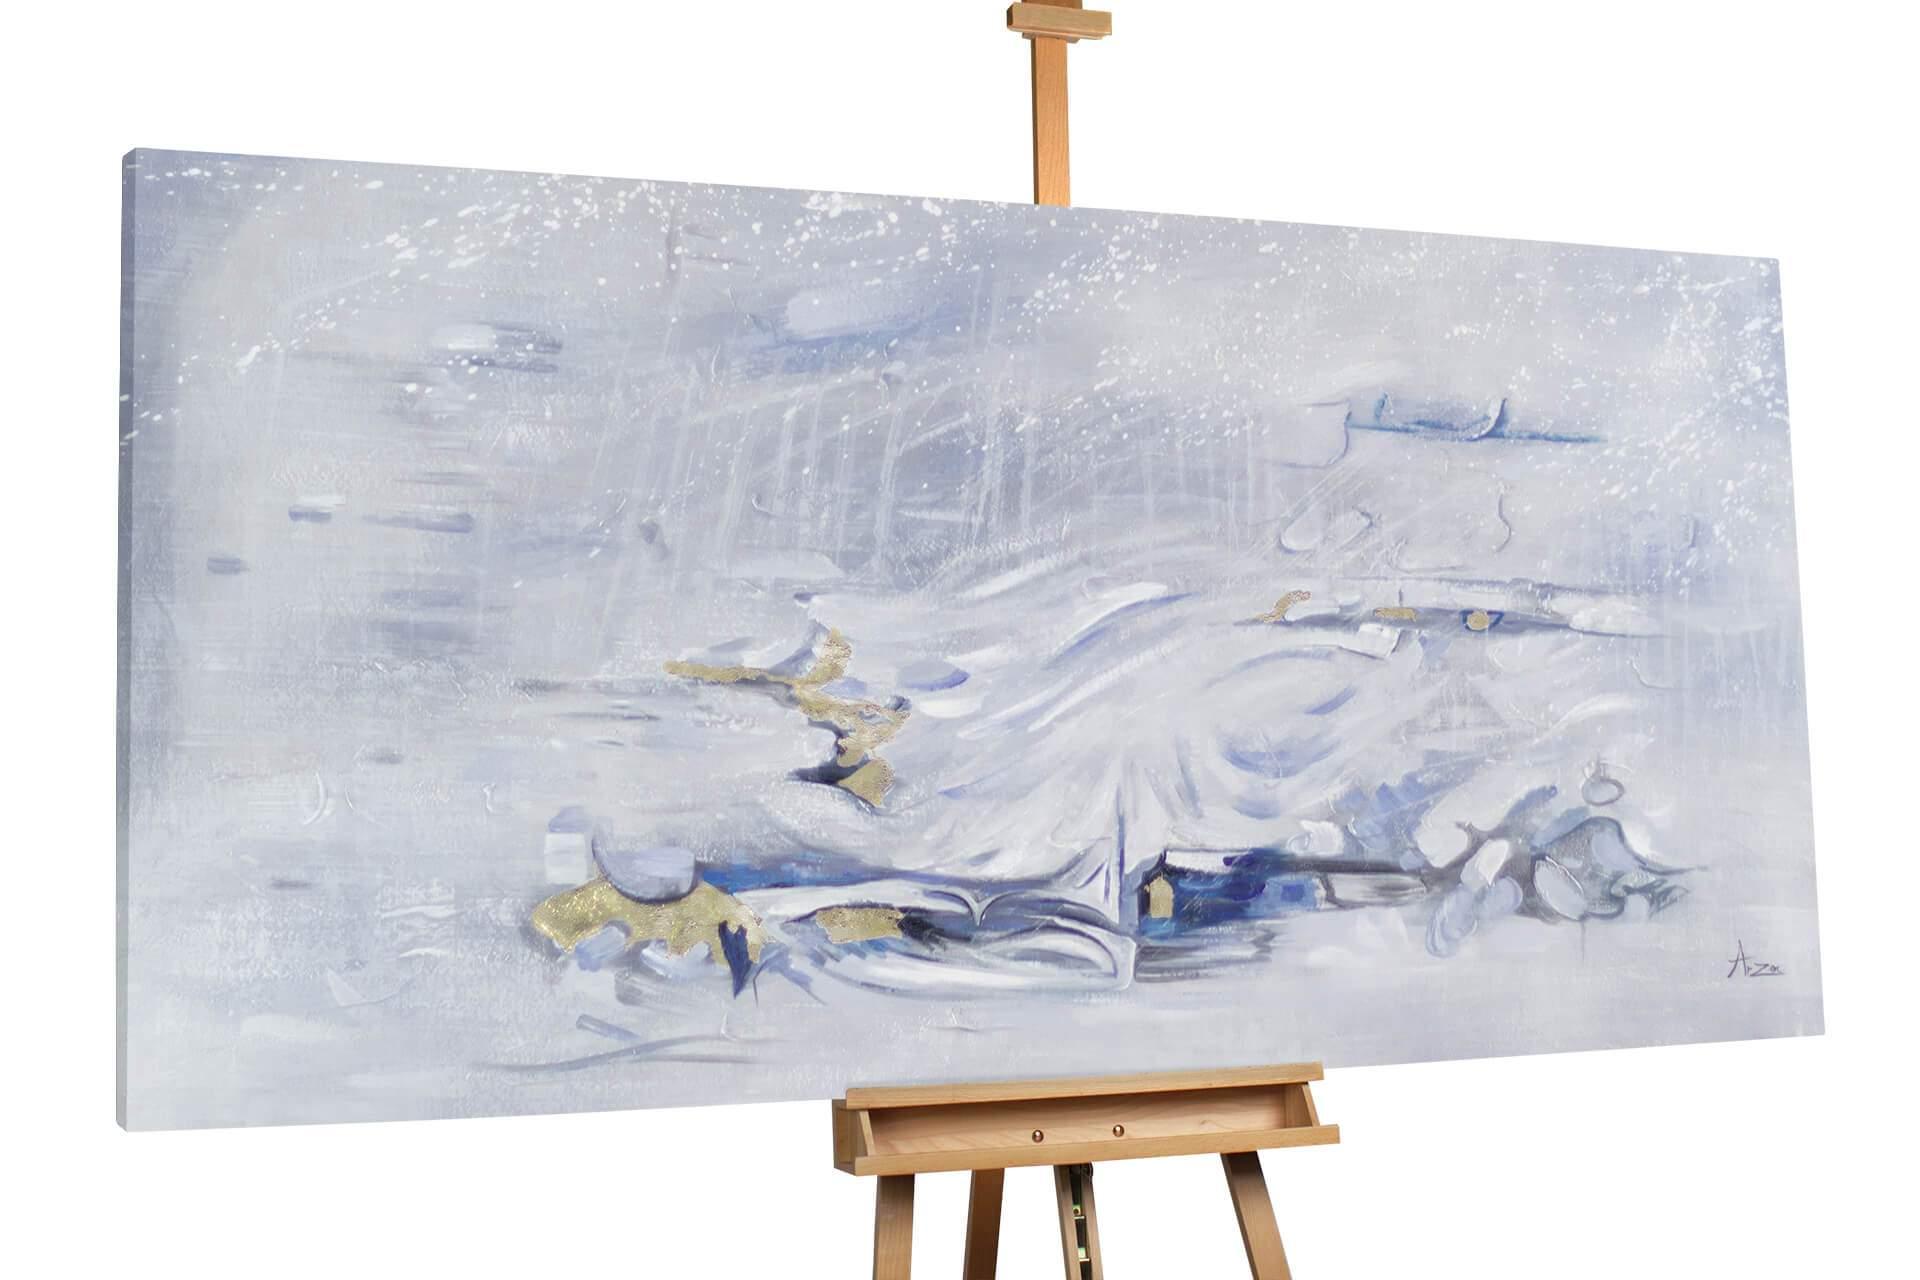 kl abstrakt blau grau gold blau grau oel gemaelde oel bilder handgemalte unikate moderne kunst 0002 01